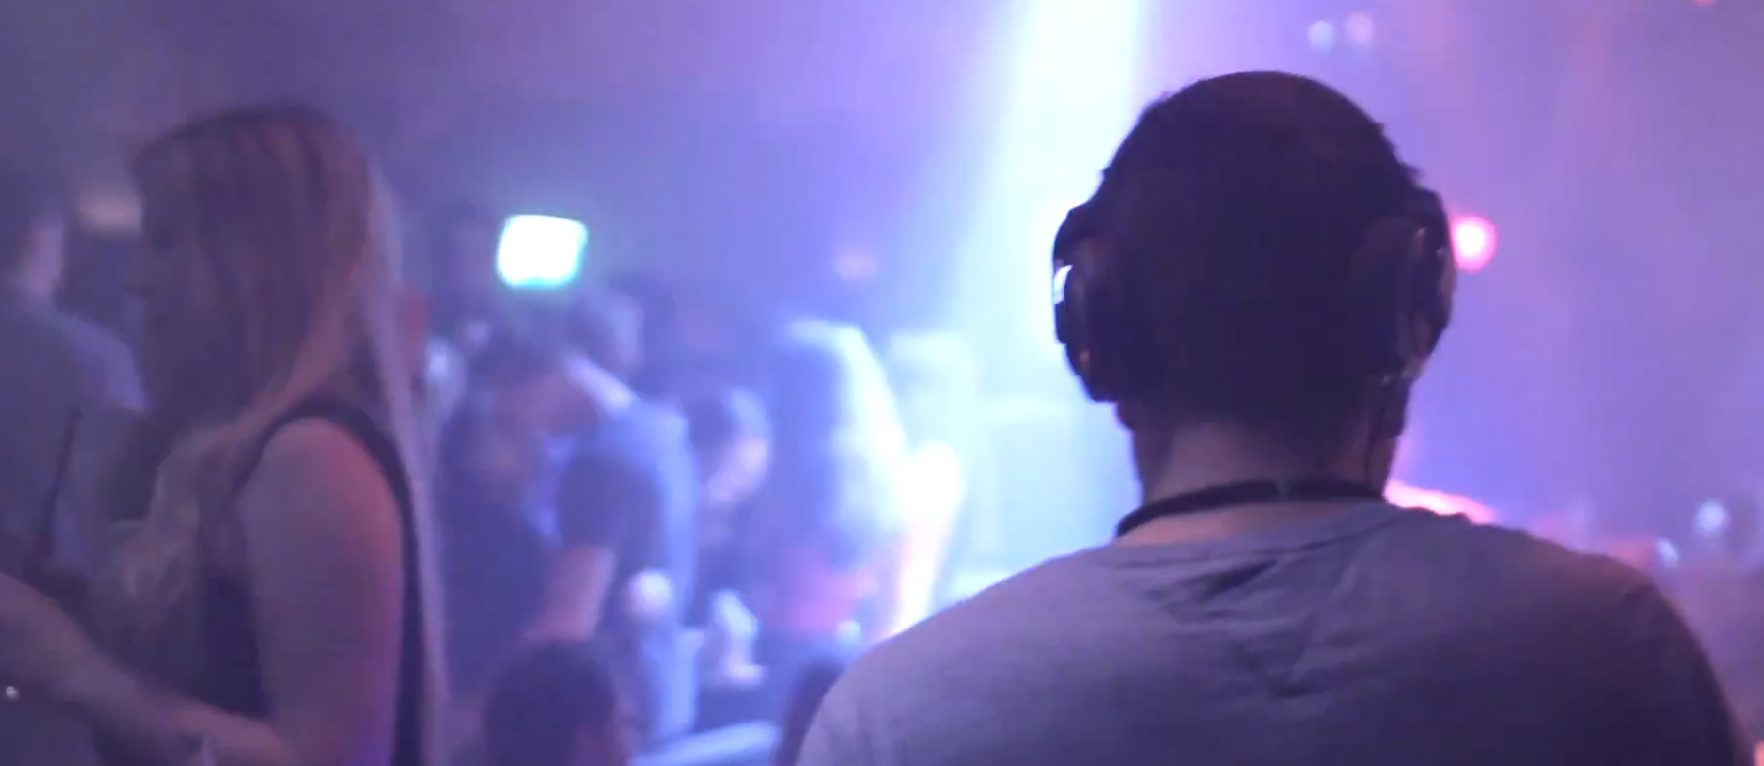 Loewenherz Lounge Tanz in den Mai 2014 - Stephan Franz Photography